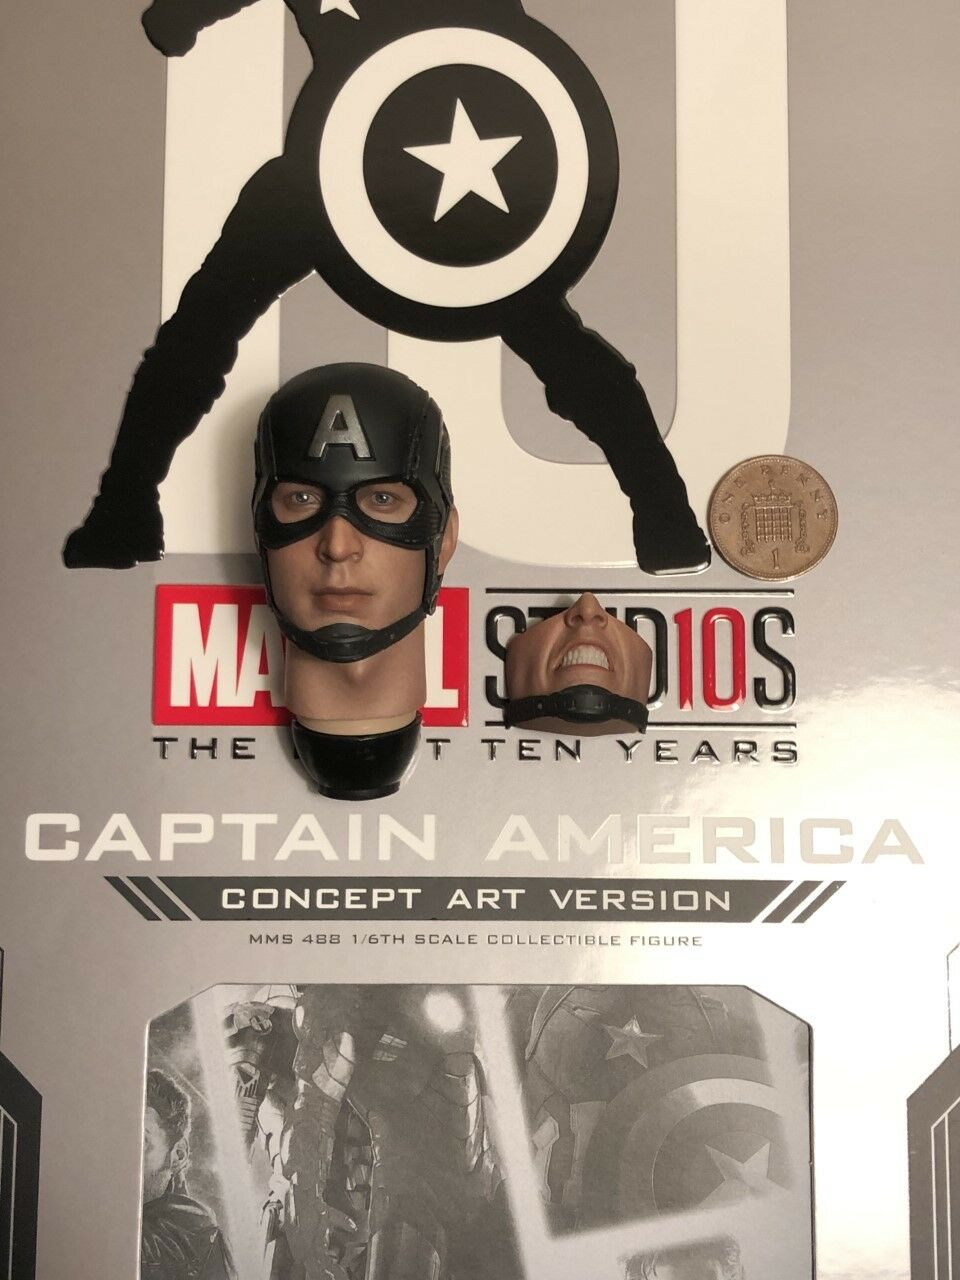 Hot Toys Captain America Concept Art MMS488 Head Head Head Sculpt loose 1 6th scale a35557